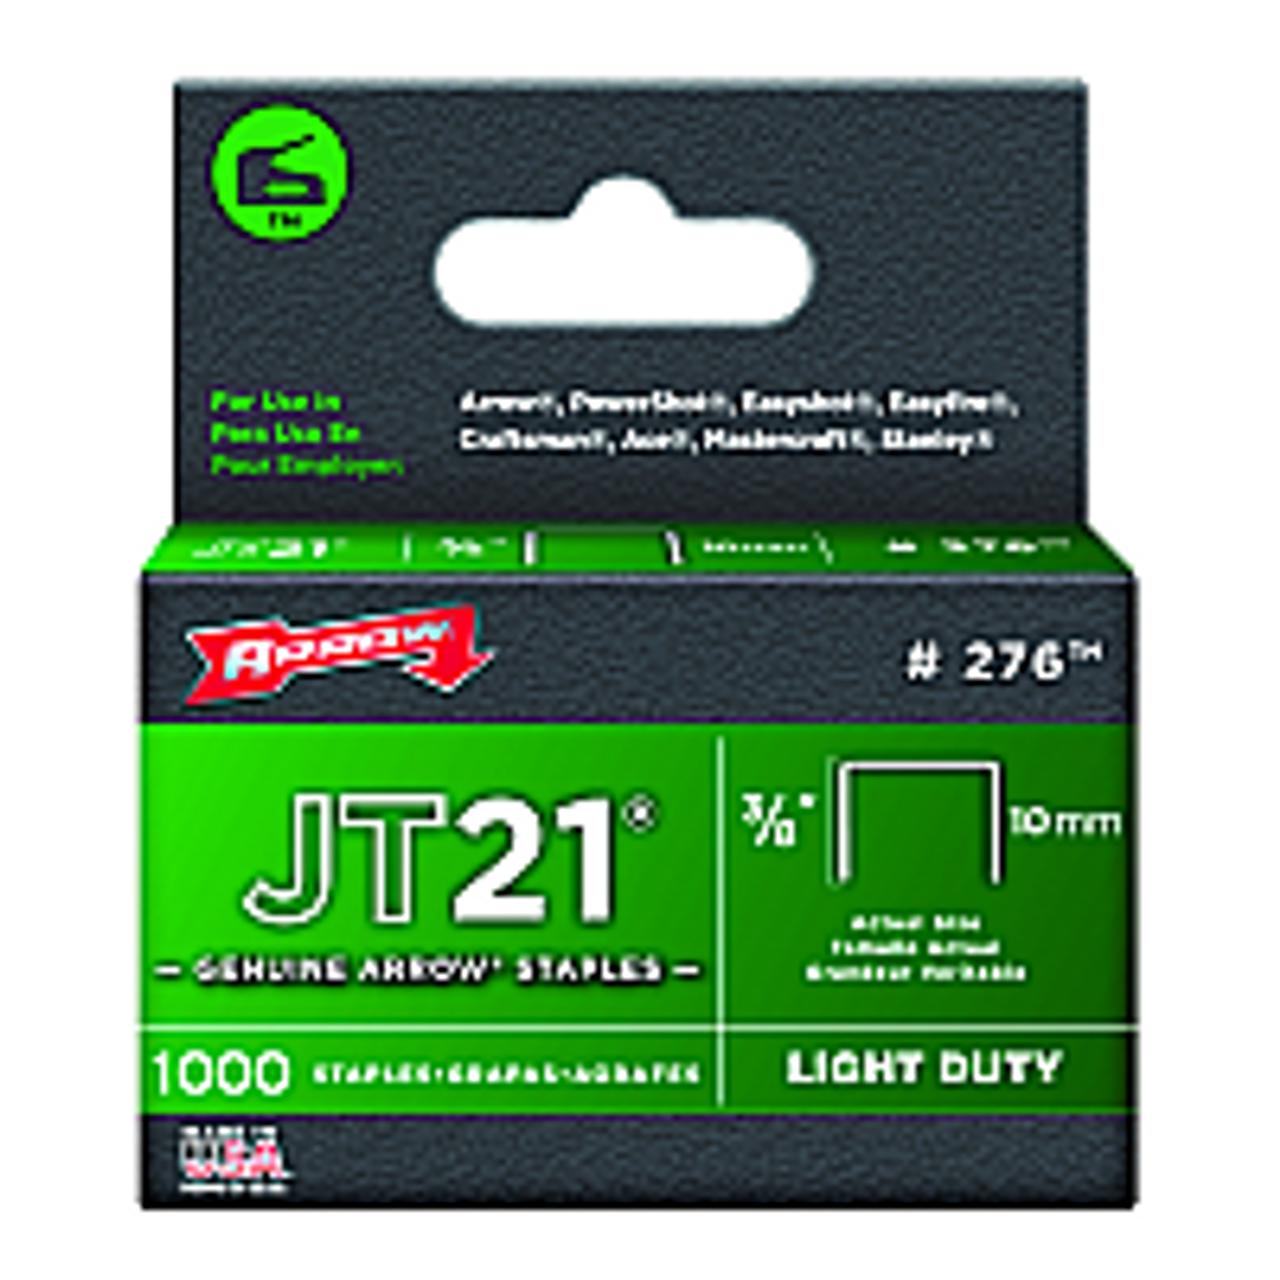 "ARROW FASTENER 276 3/8"" 10MM JT-21 STAPLES"